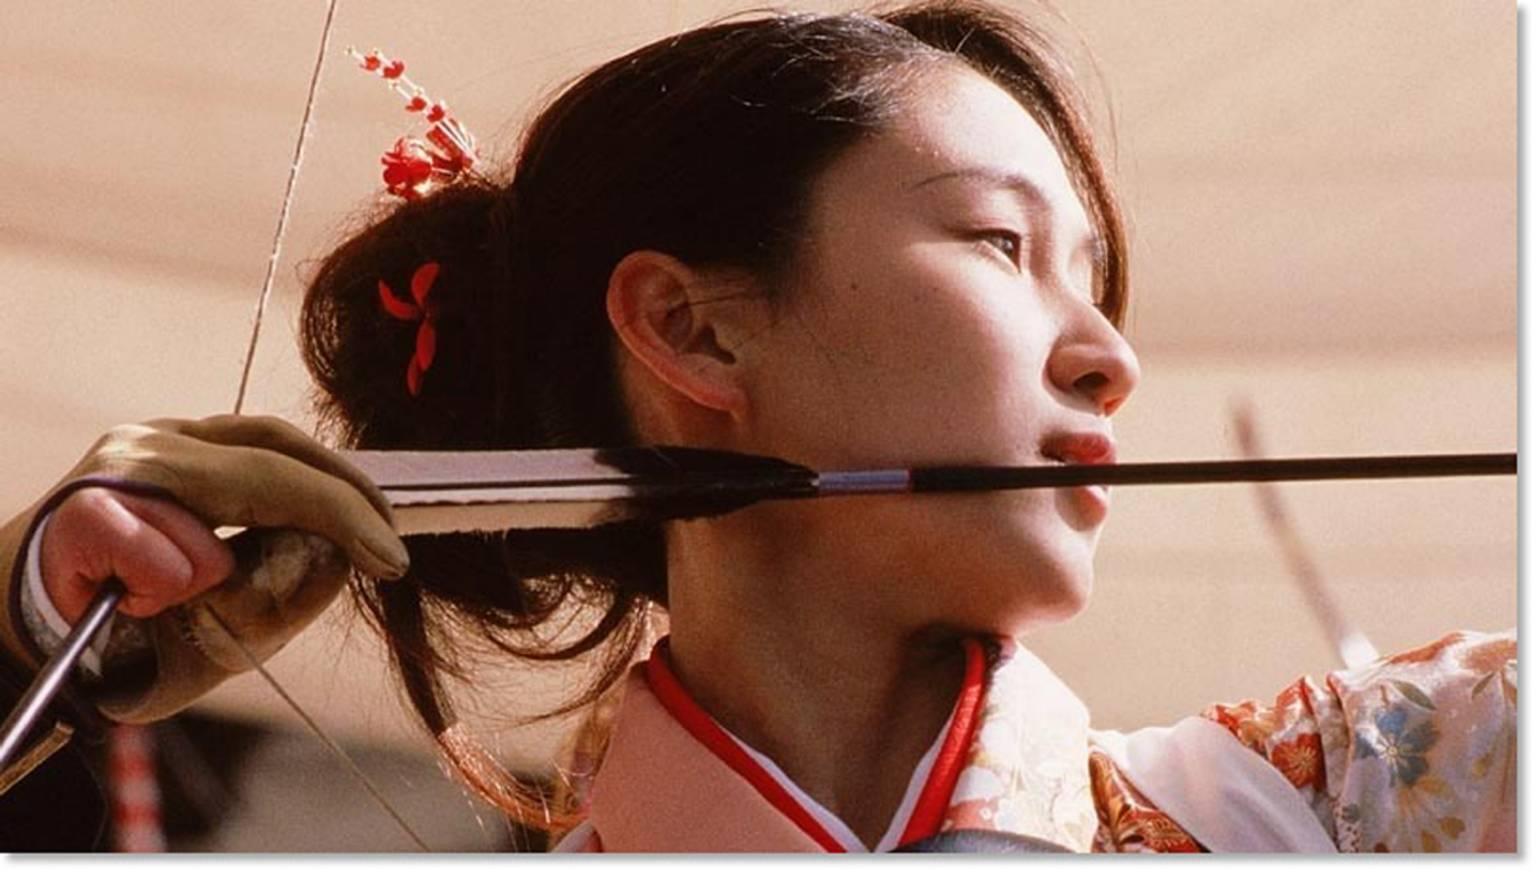 Fiona Tan, 'Saint Sebastian' 2001